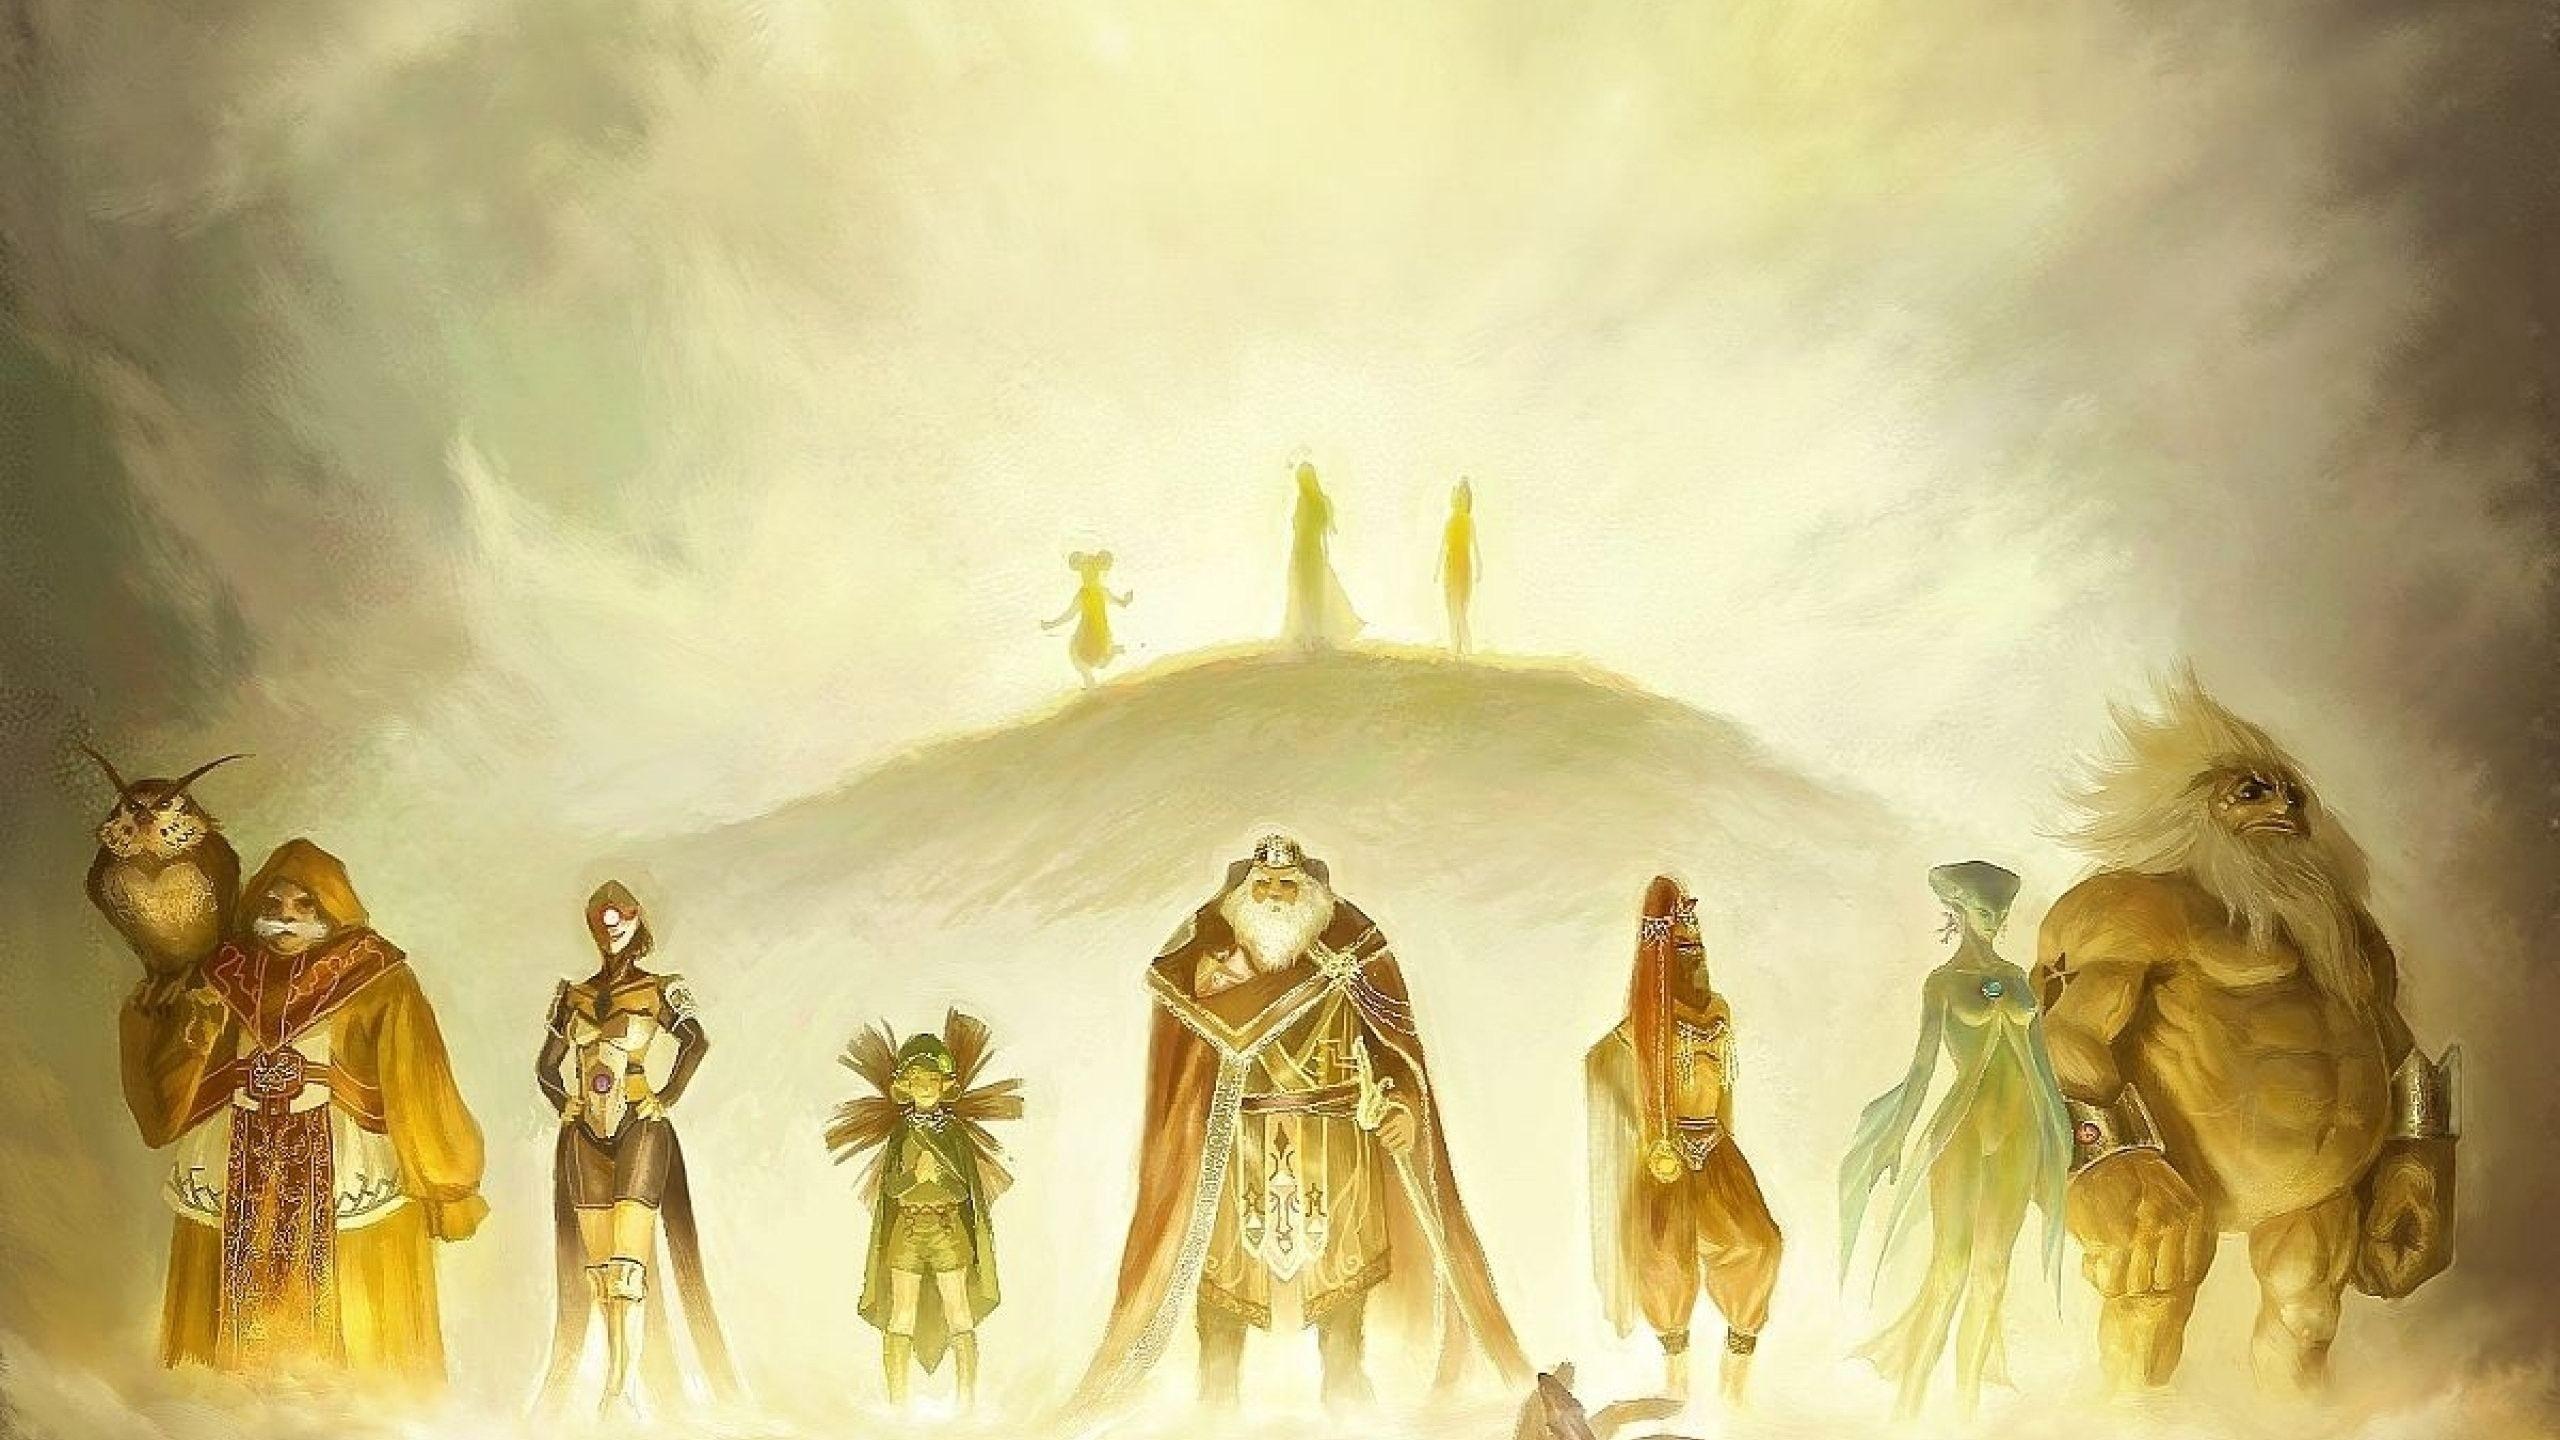 Legend Of Zelda Twilight Princess Wallpapers High Resolution